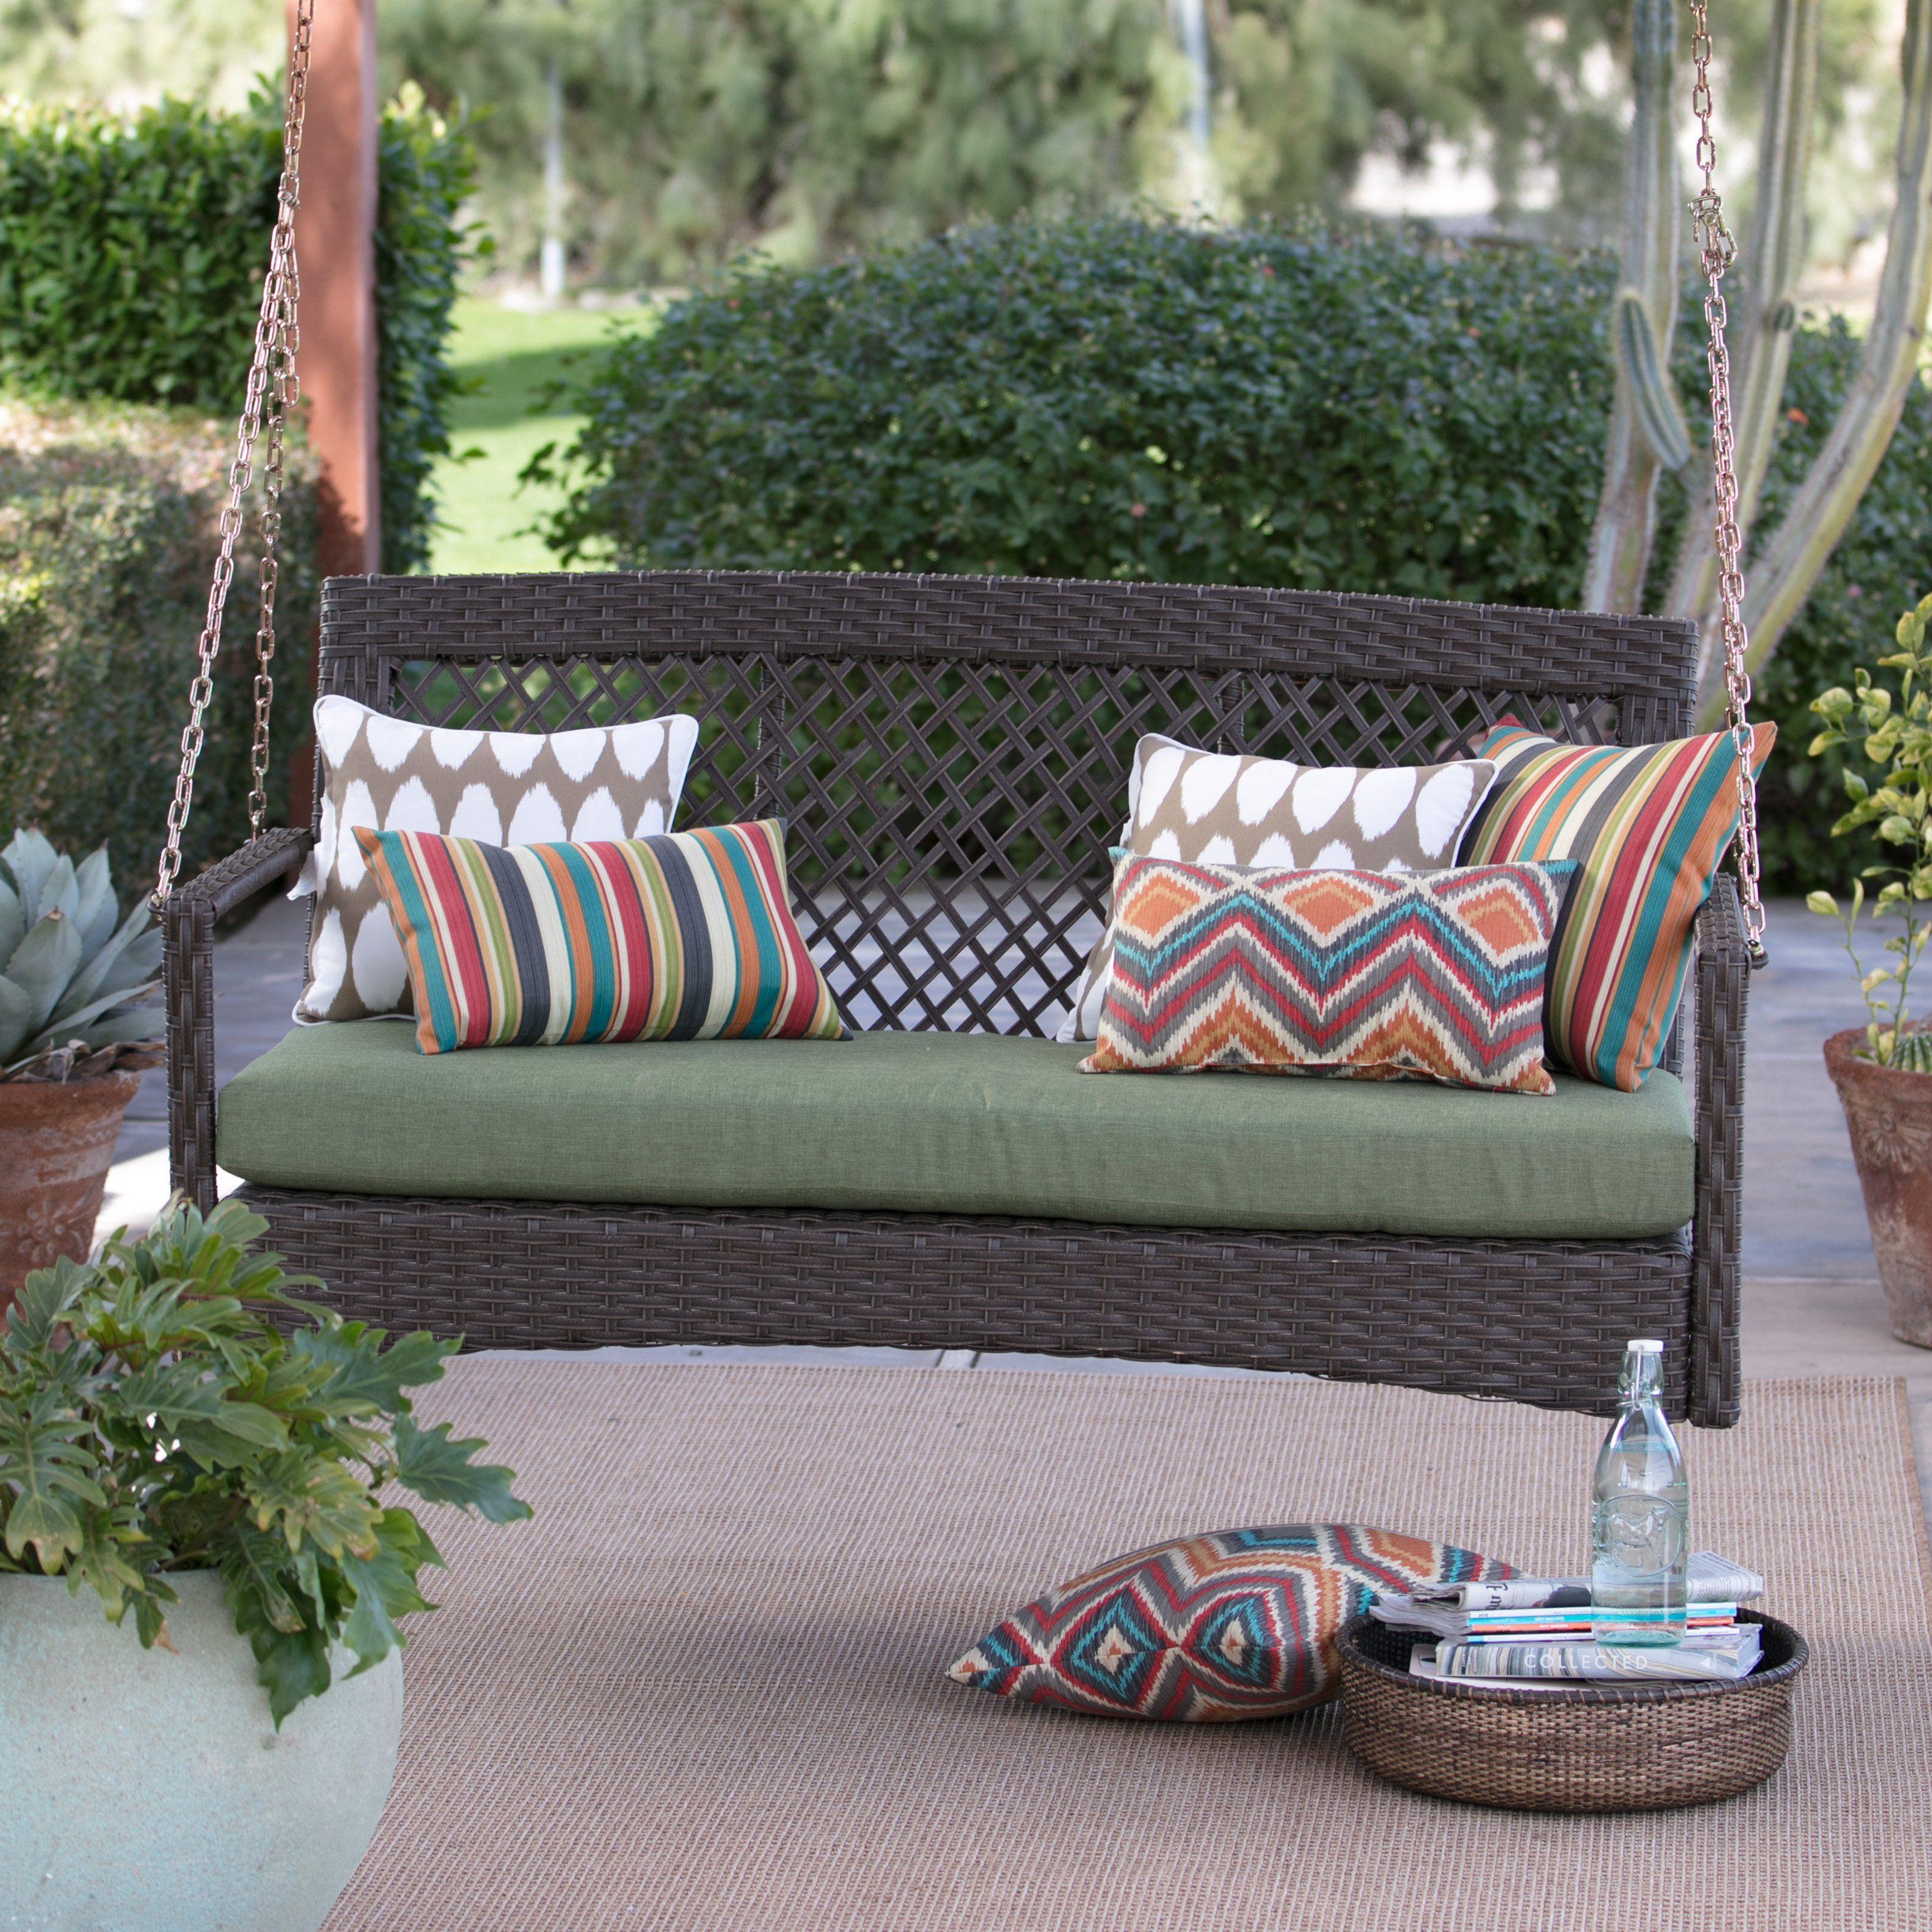 Belham Living Asheville 4 Ft Resin Wicker Porch Swing With Cushion